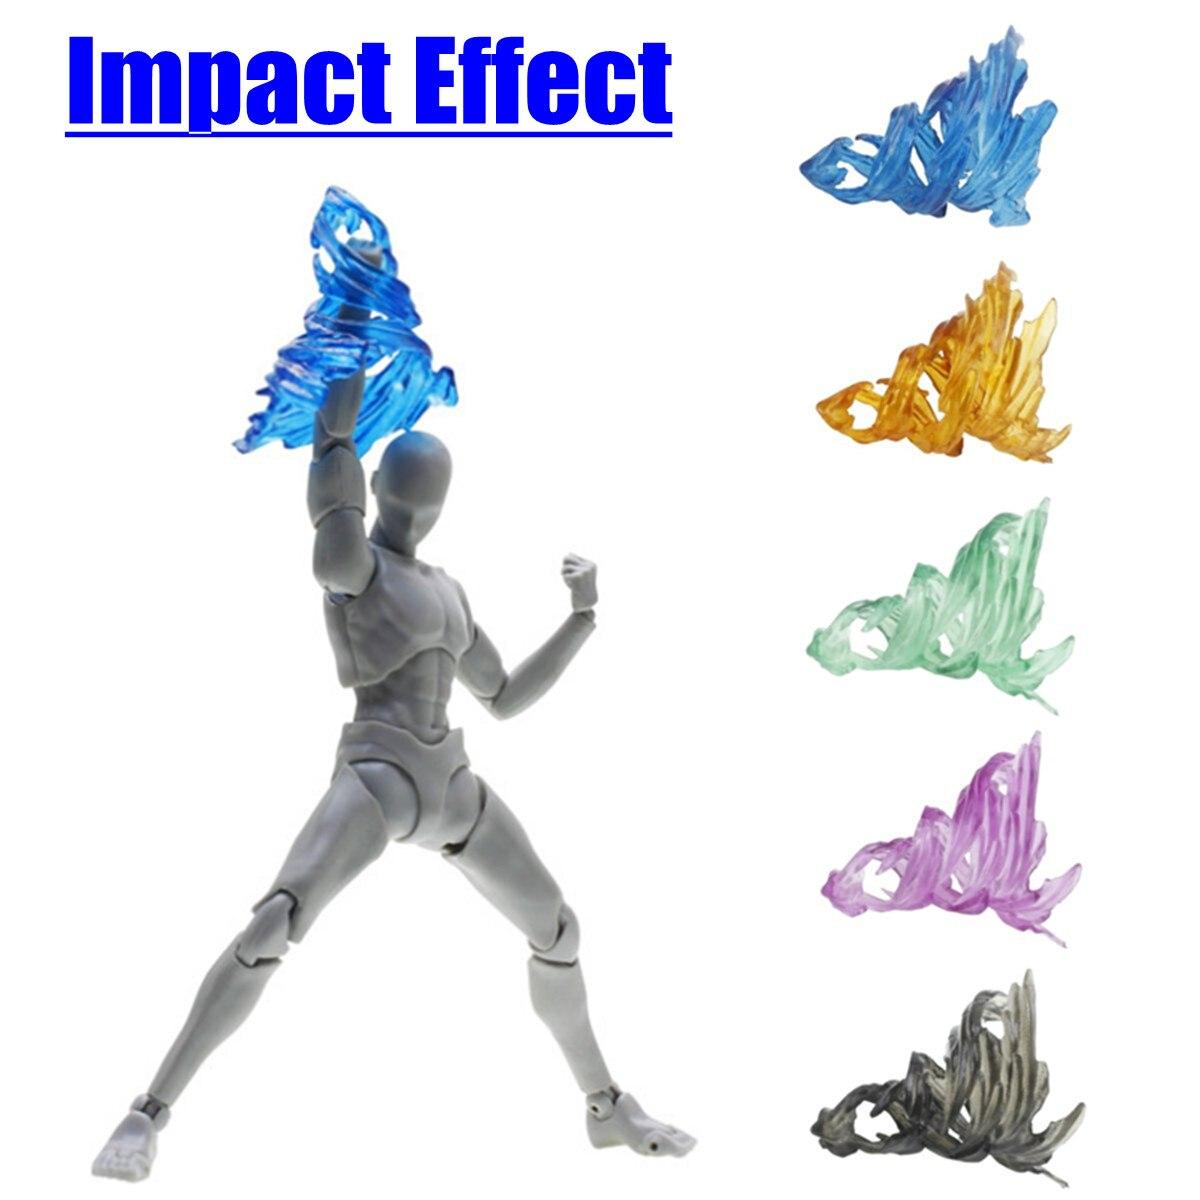 Plastic Tamashii Screw Impact Effect Model Kamen Rider Figma SHF Action Figure Kick Toys Special Effect Action Toy FiguresAction & Toy Figures   -